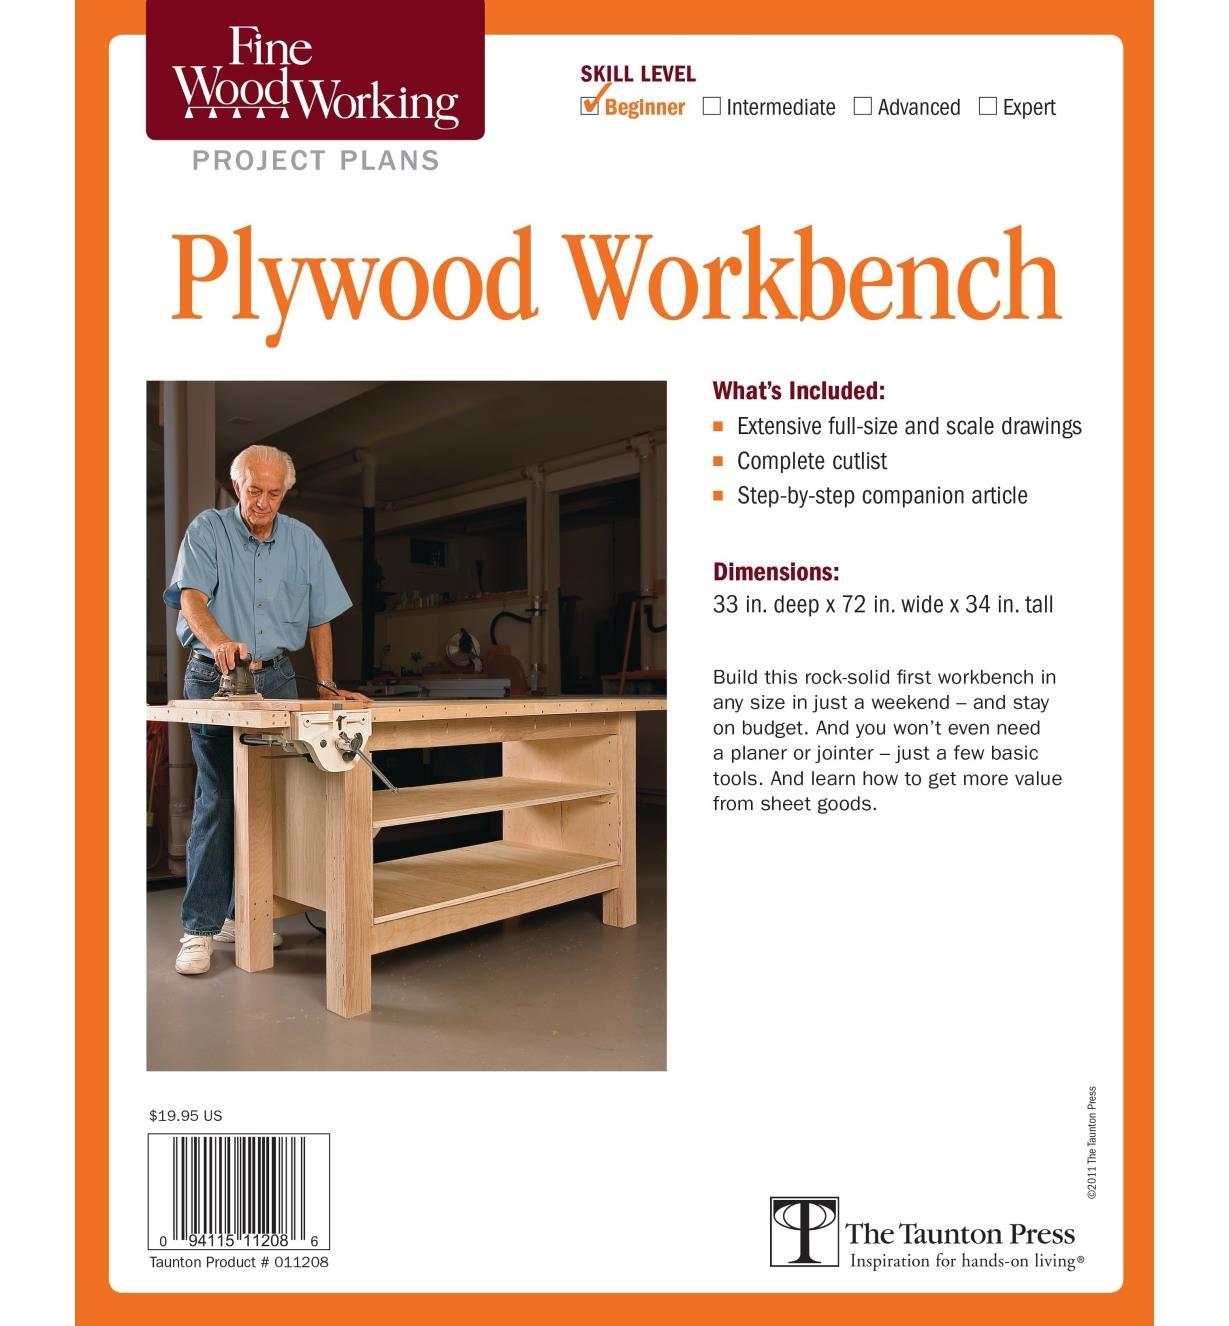 73L2511 - Plywood Workbench Plan